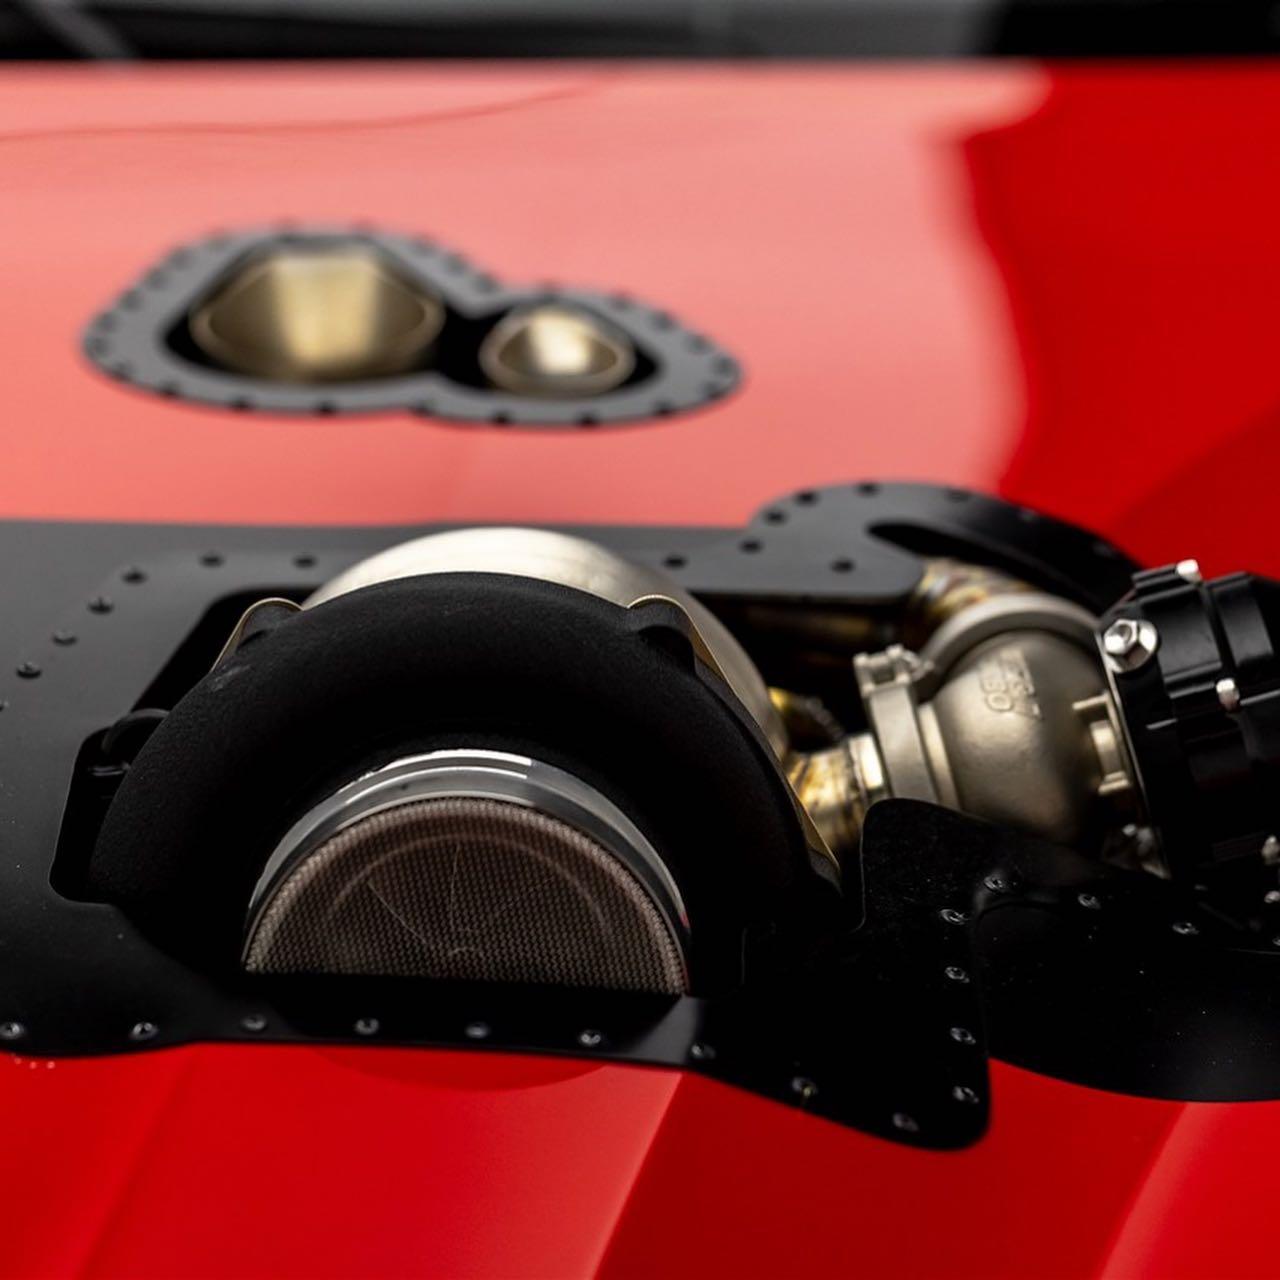 Twin-Turbo-Ferrari-F12-Berlinetta-by-Daily-Driven-Exotics-3